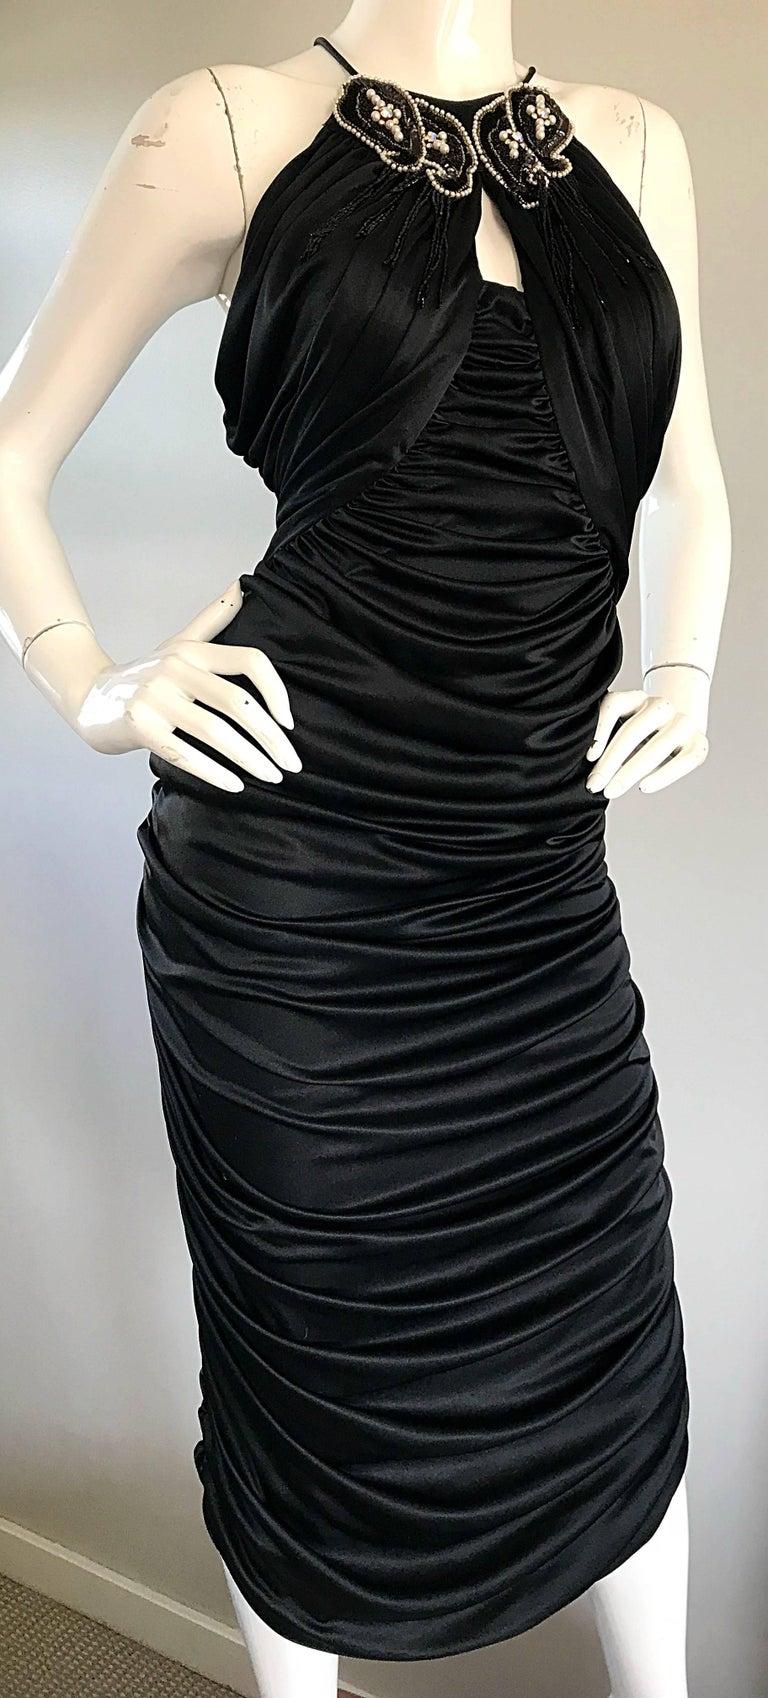 1970s Vintage Samir Black Beaded + Pearl + Rhinestone Sexy Ruched 70s Dress 4